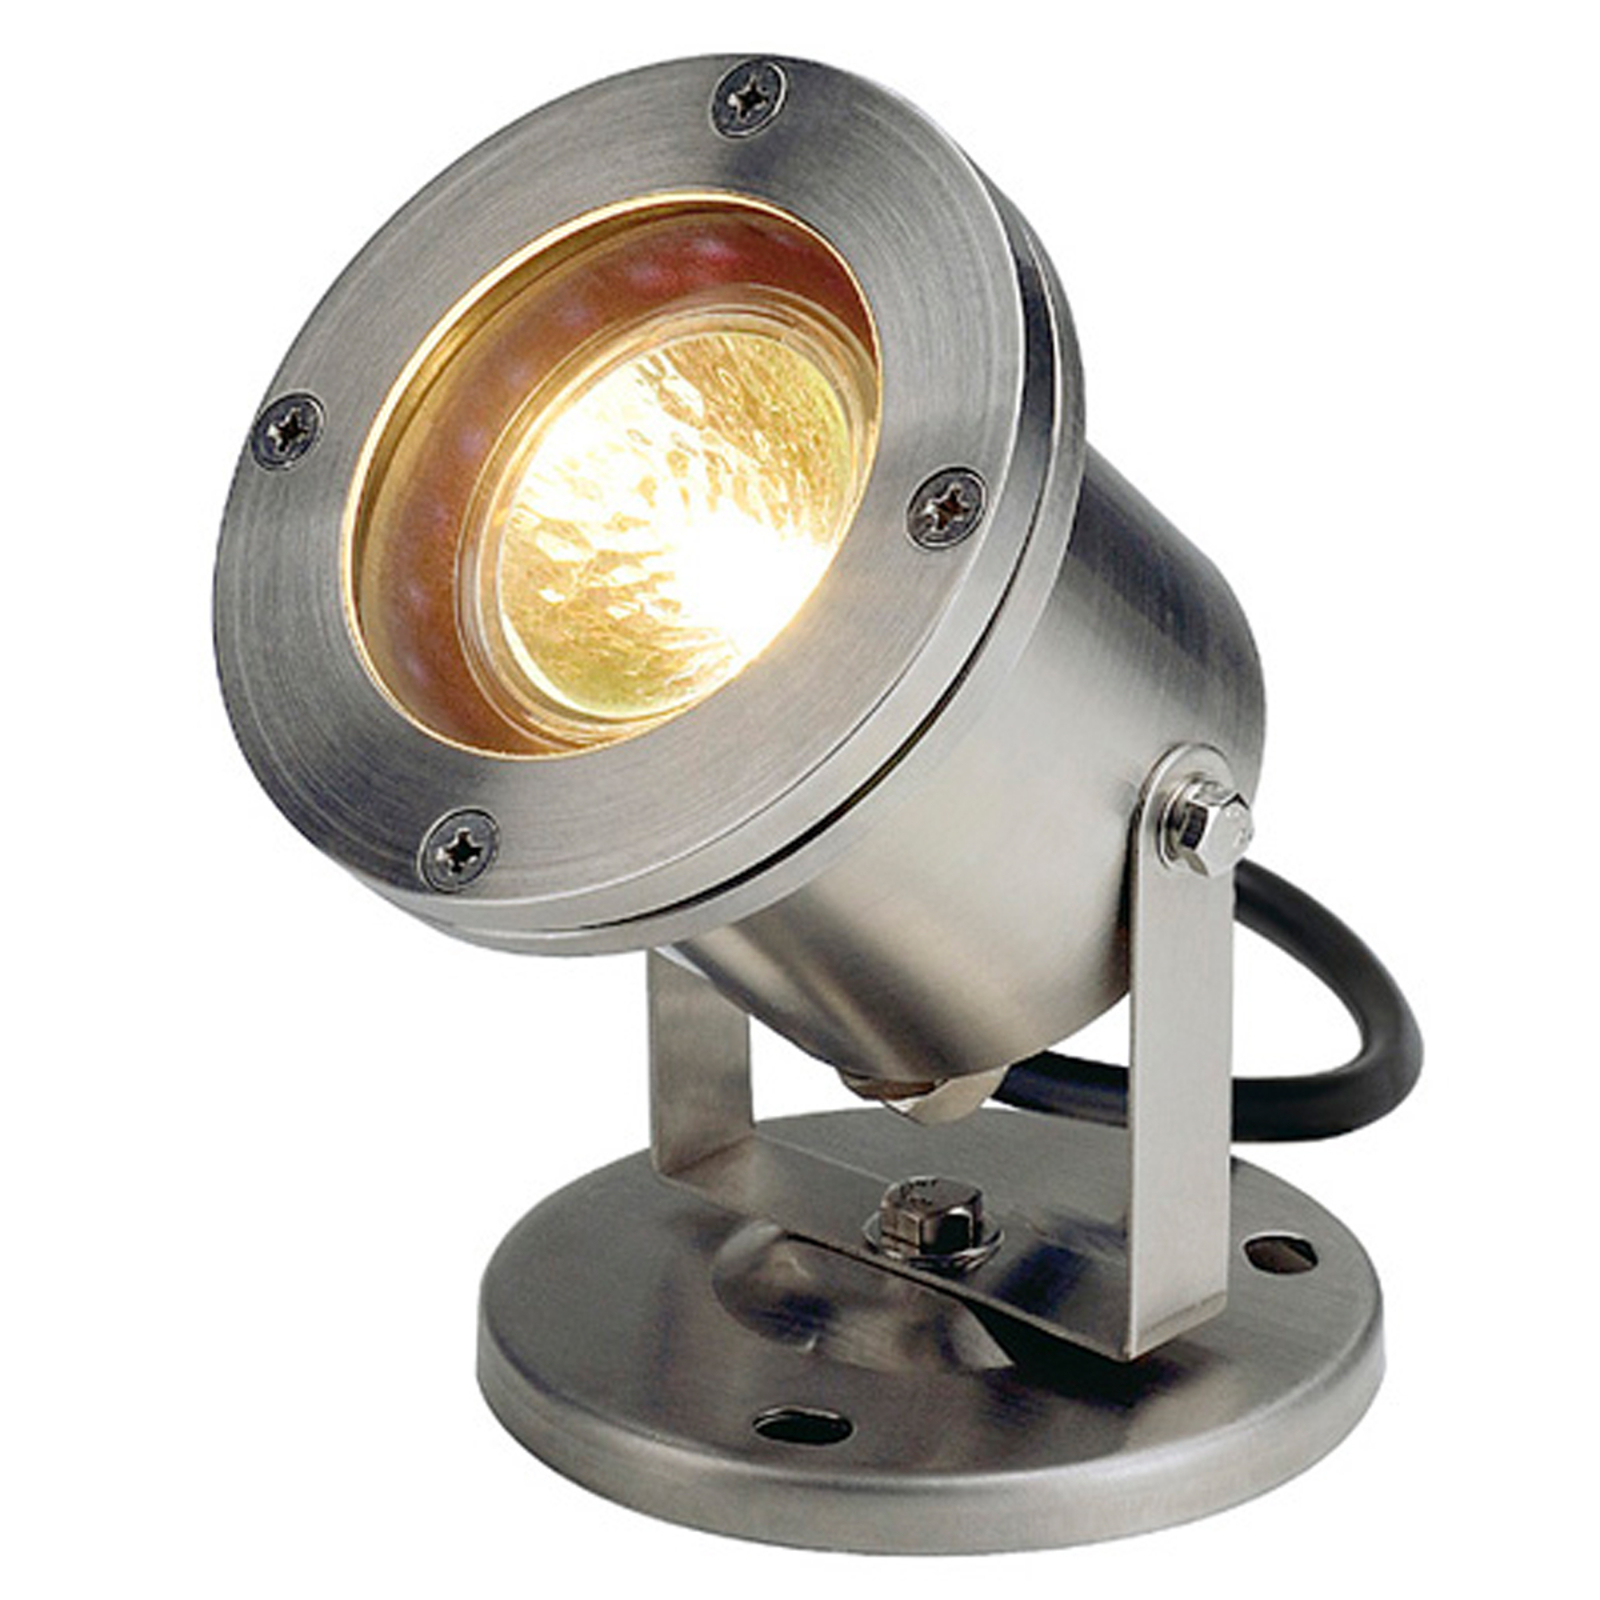 SLV Nautilus udendørs spotlampe IP67 MR16